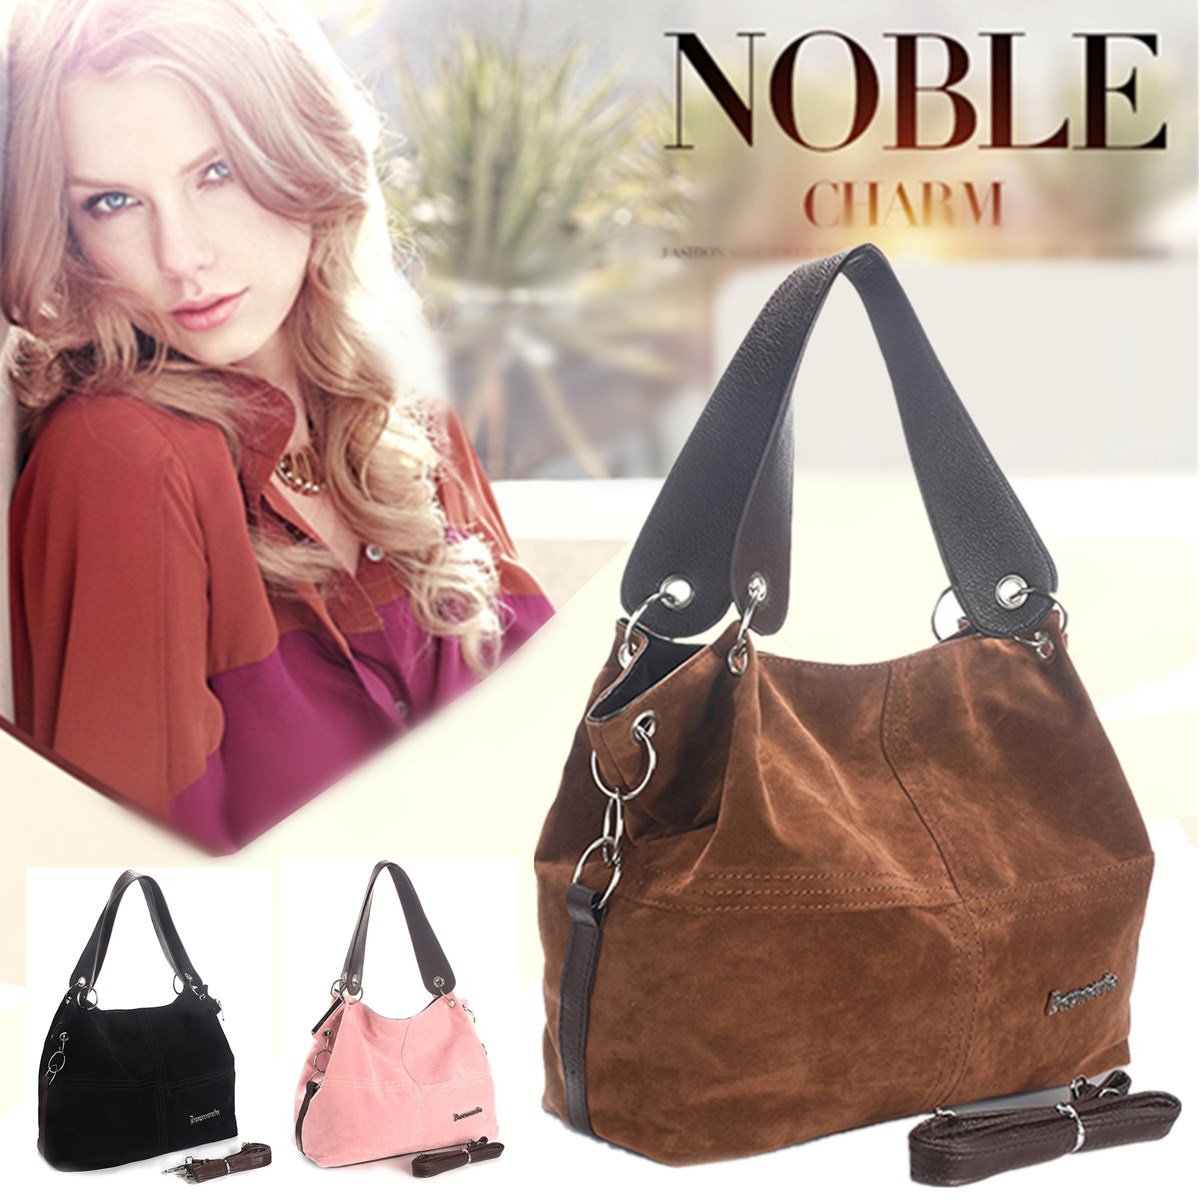 Vintage Women Handbag Female Suede Leather Bags Shoulder Bag Crossbody Bag Ladies Hobos Casual Tote Handbags Fashion